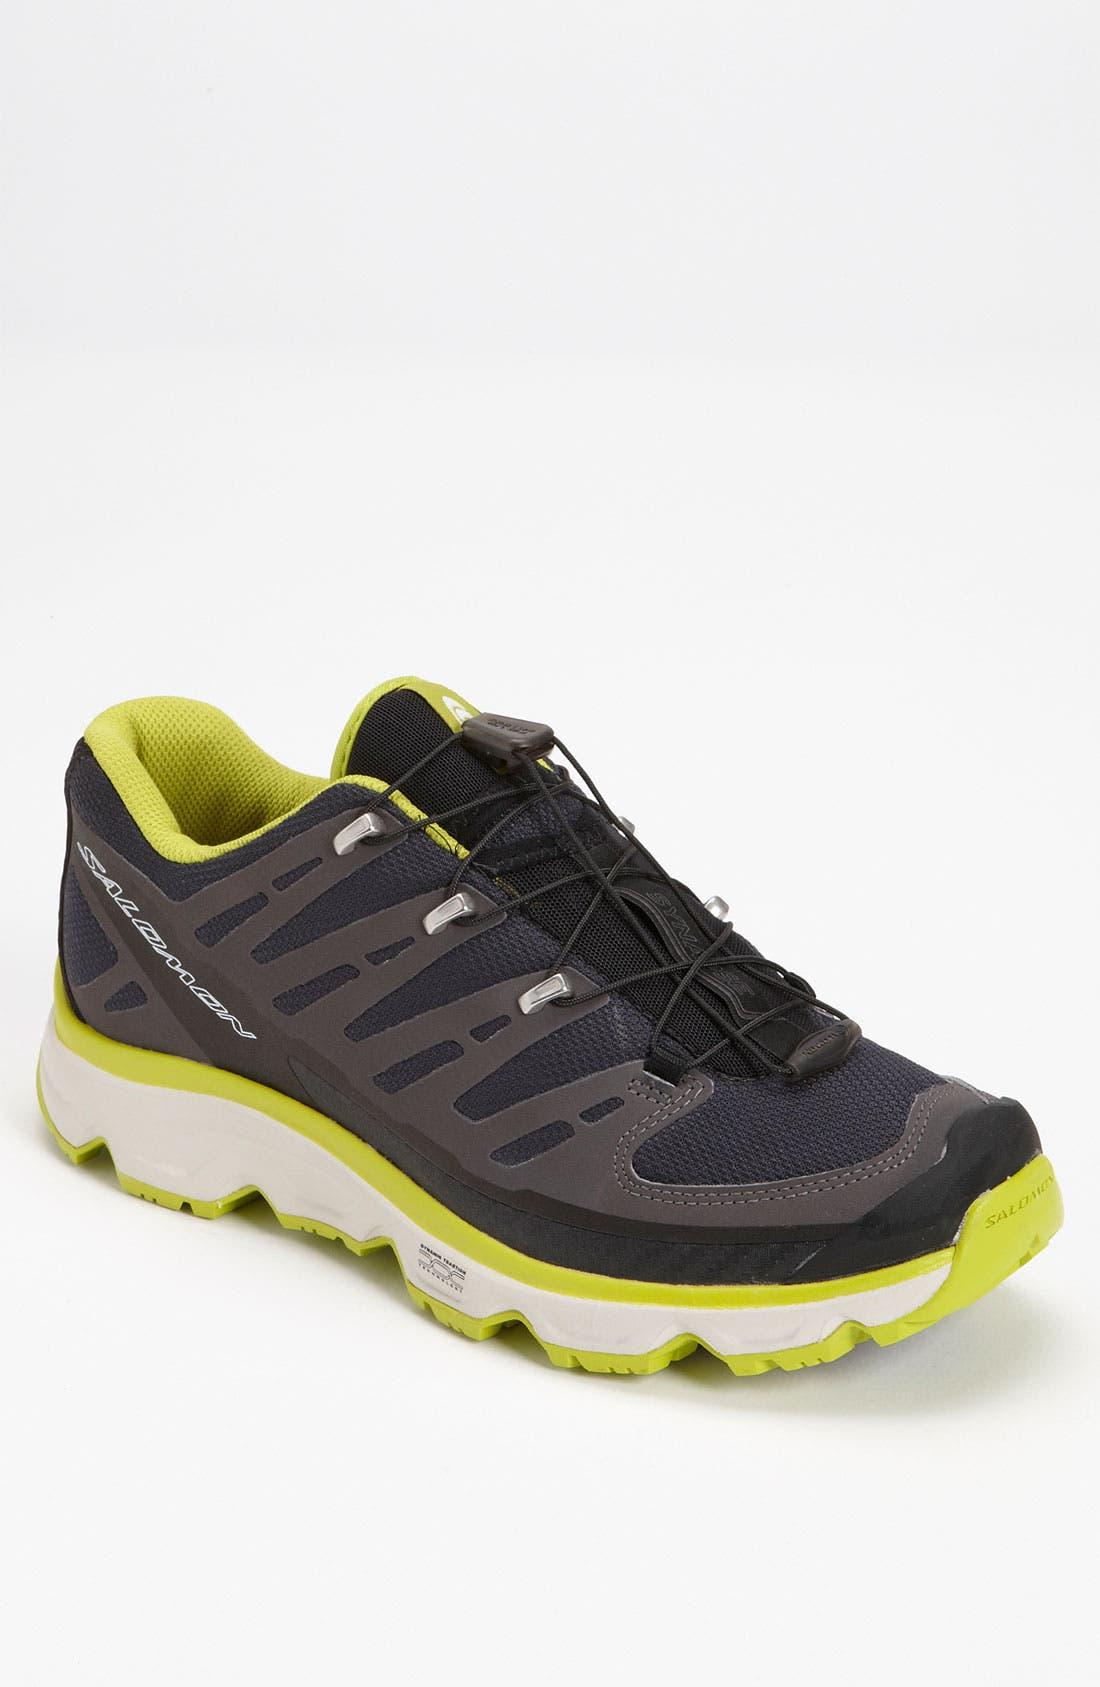 Main Image - Salomon 'Synapse' Hiking Shoe (Men)